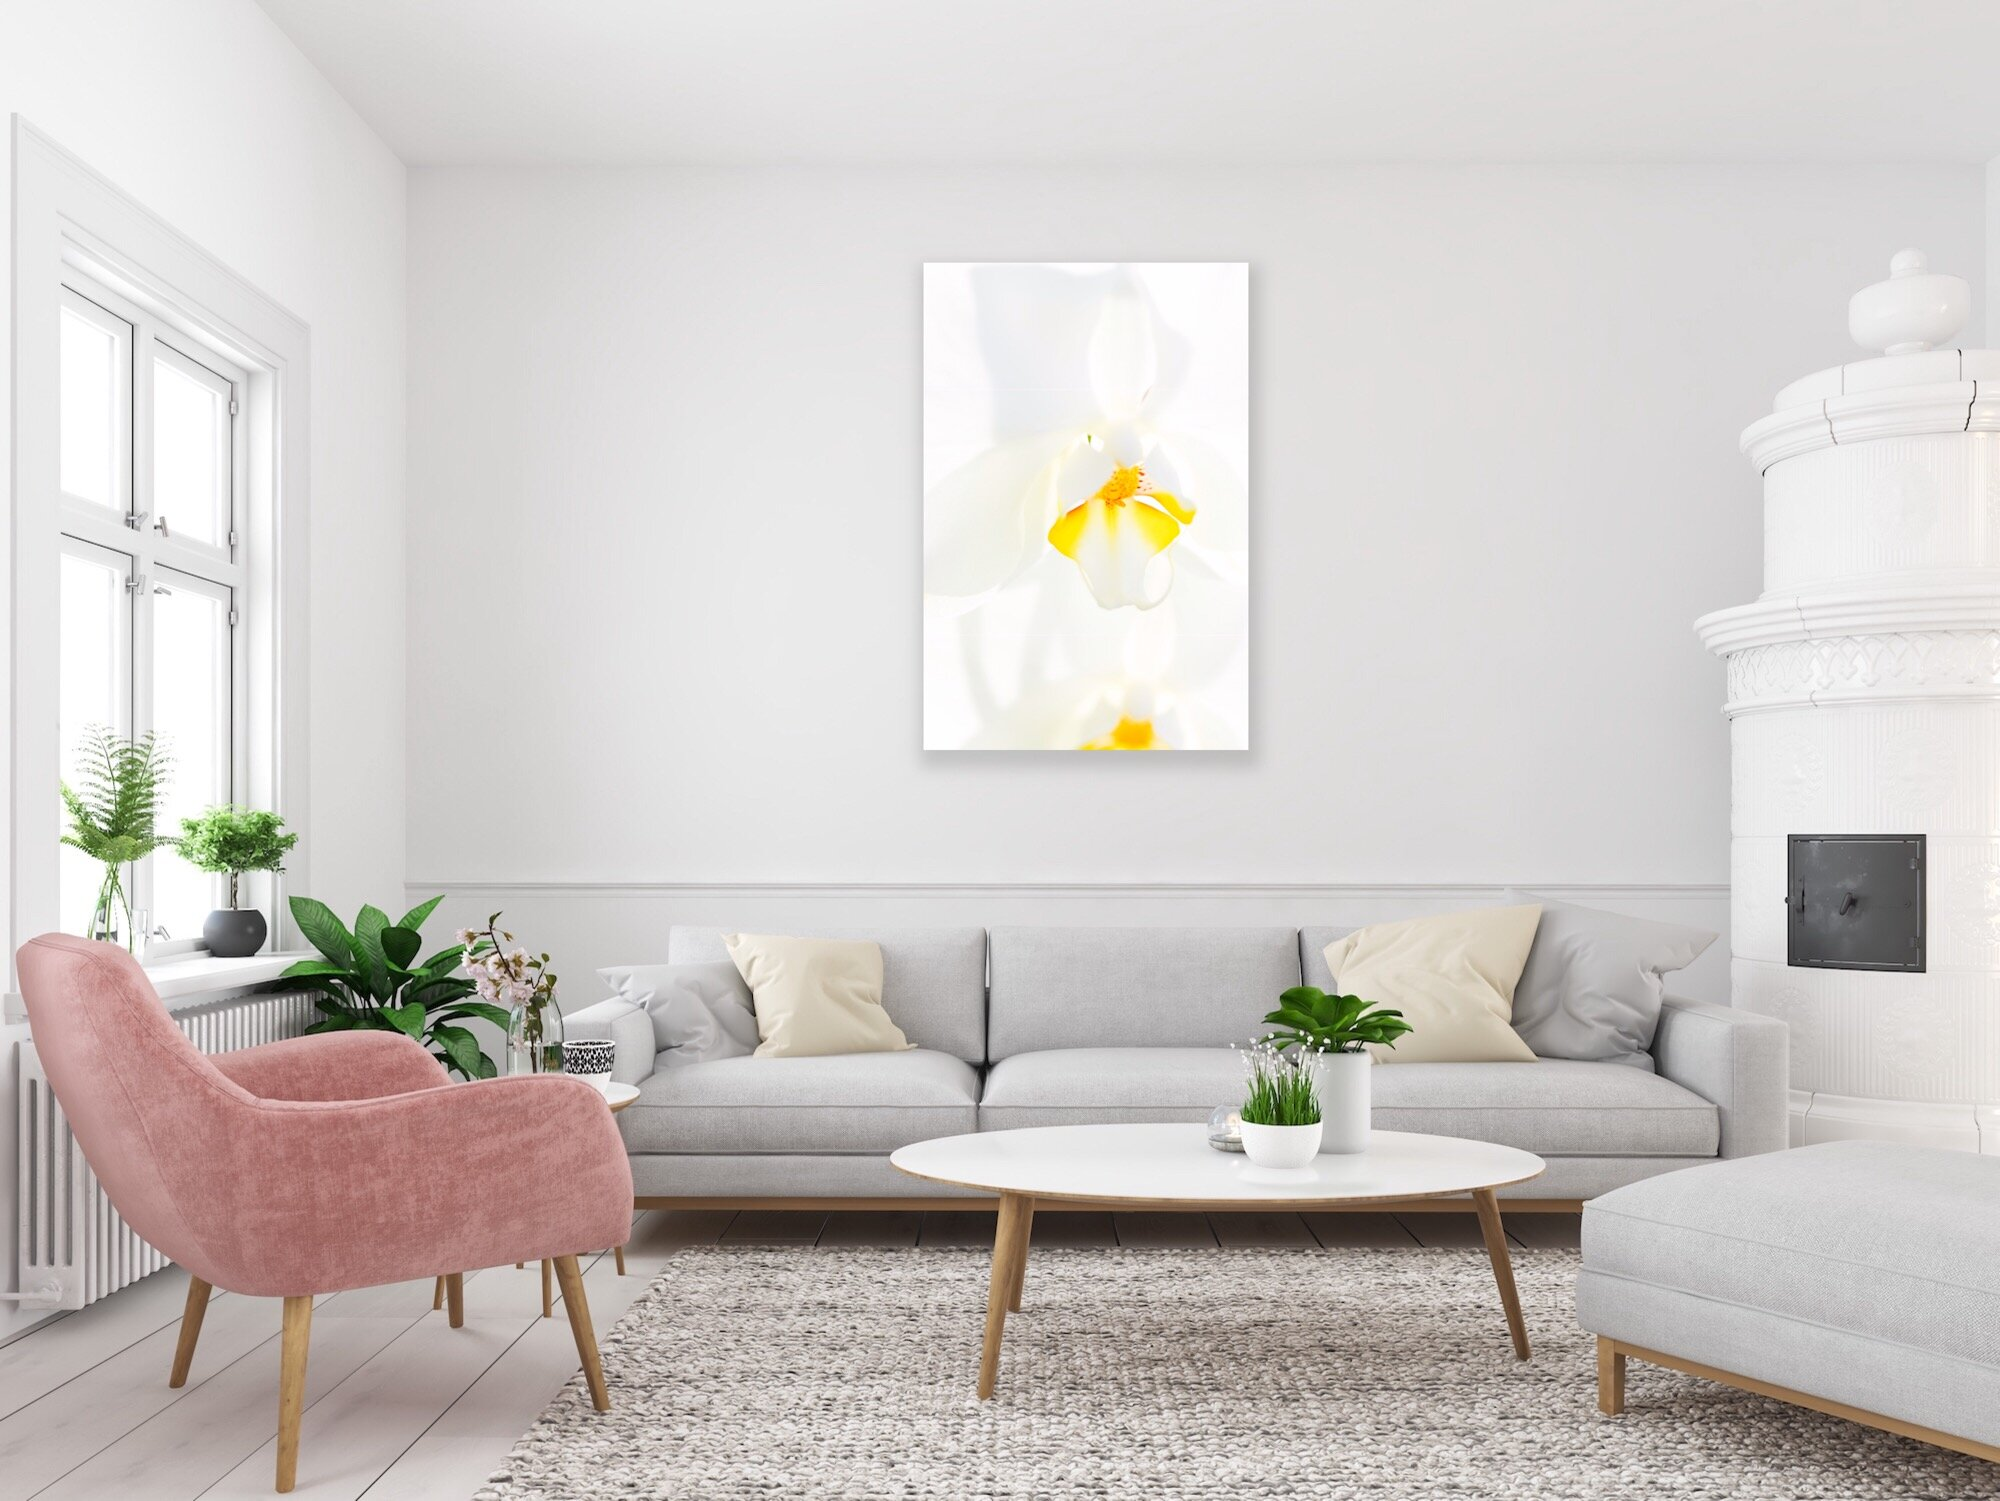 Cool_interiors_butterfly_effect.jpg